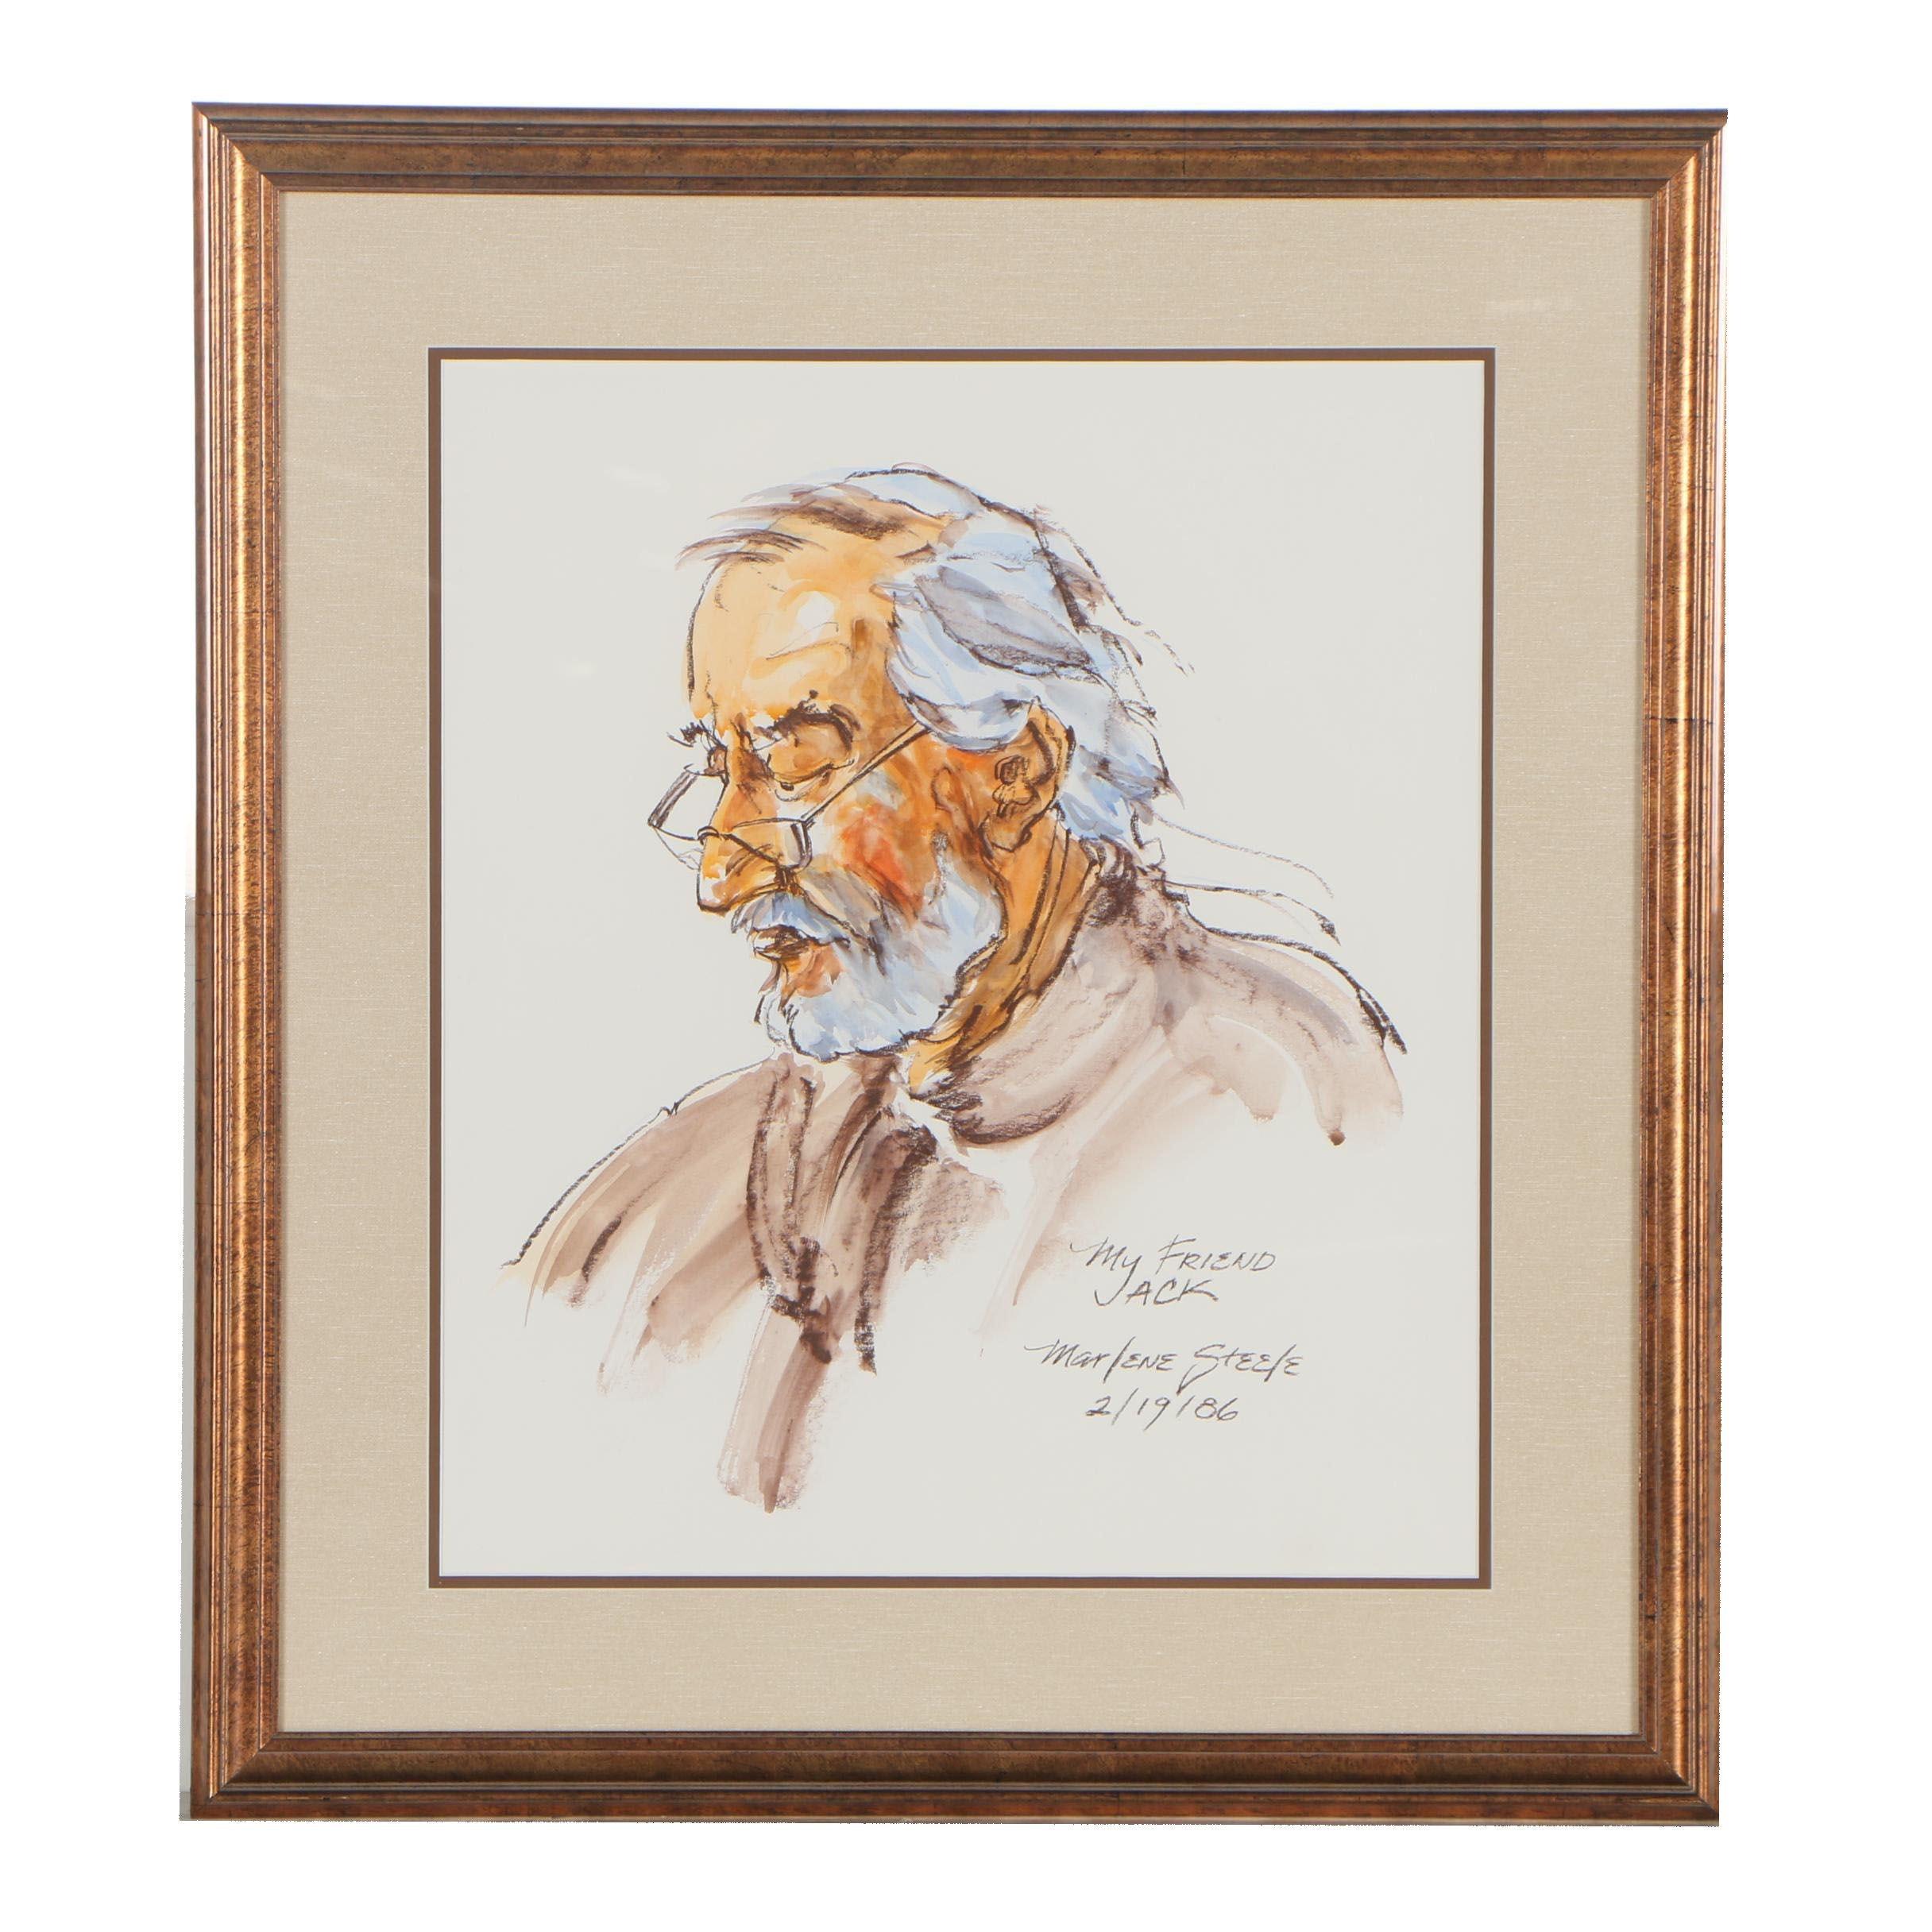 "Marlene Steele 1986 Embellished Watercolor Painting ""My Friend Jack"""